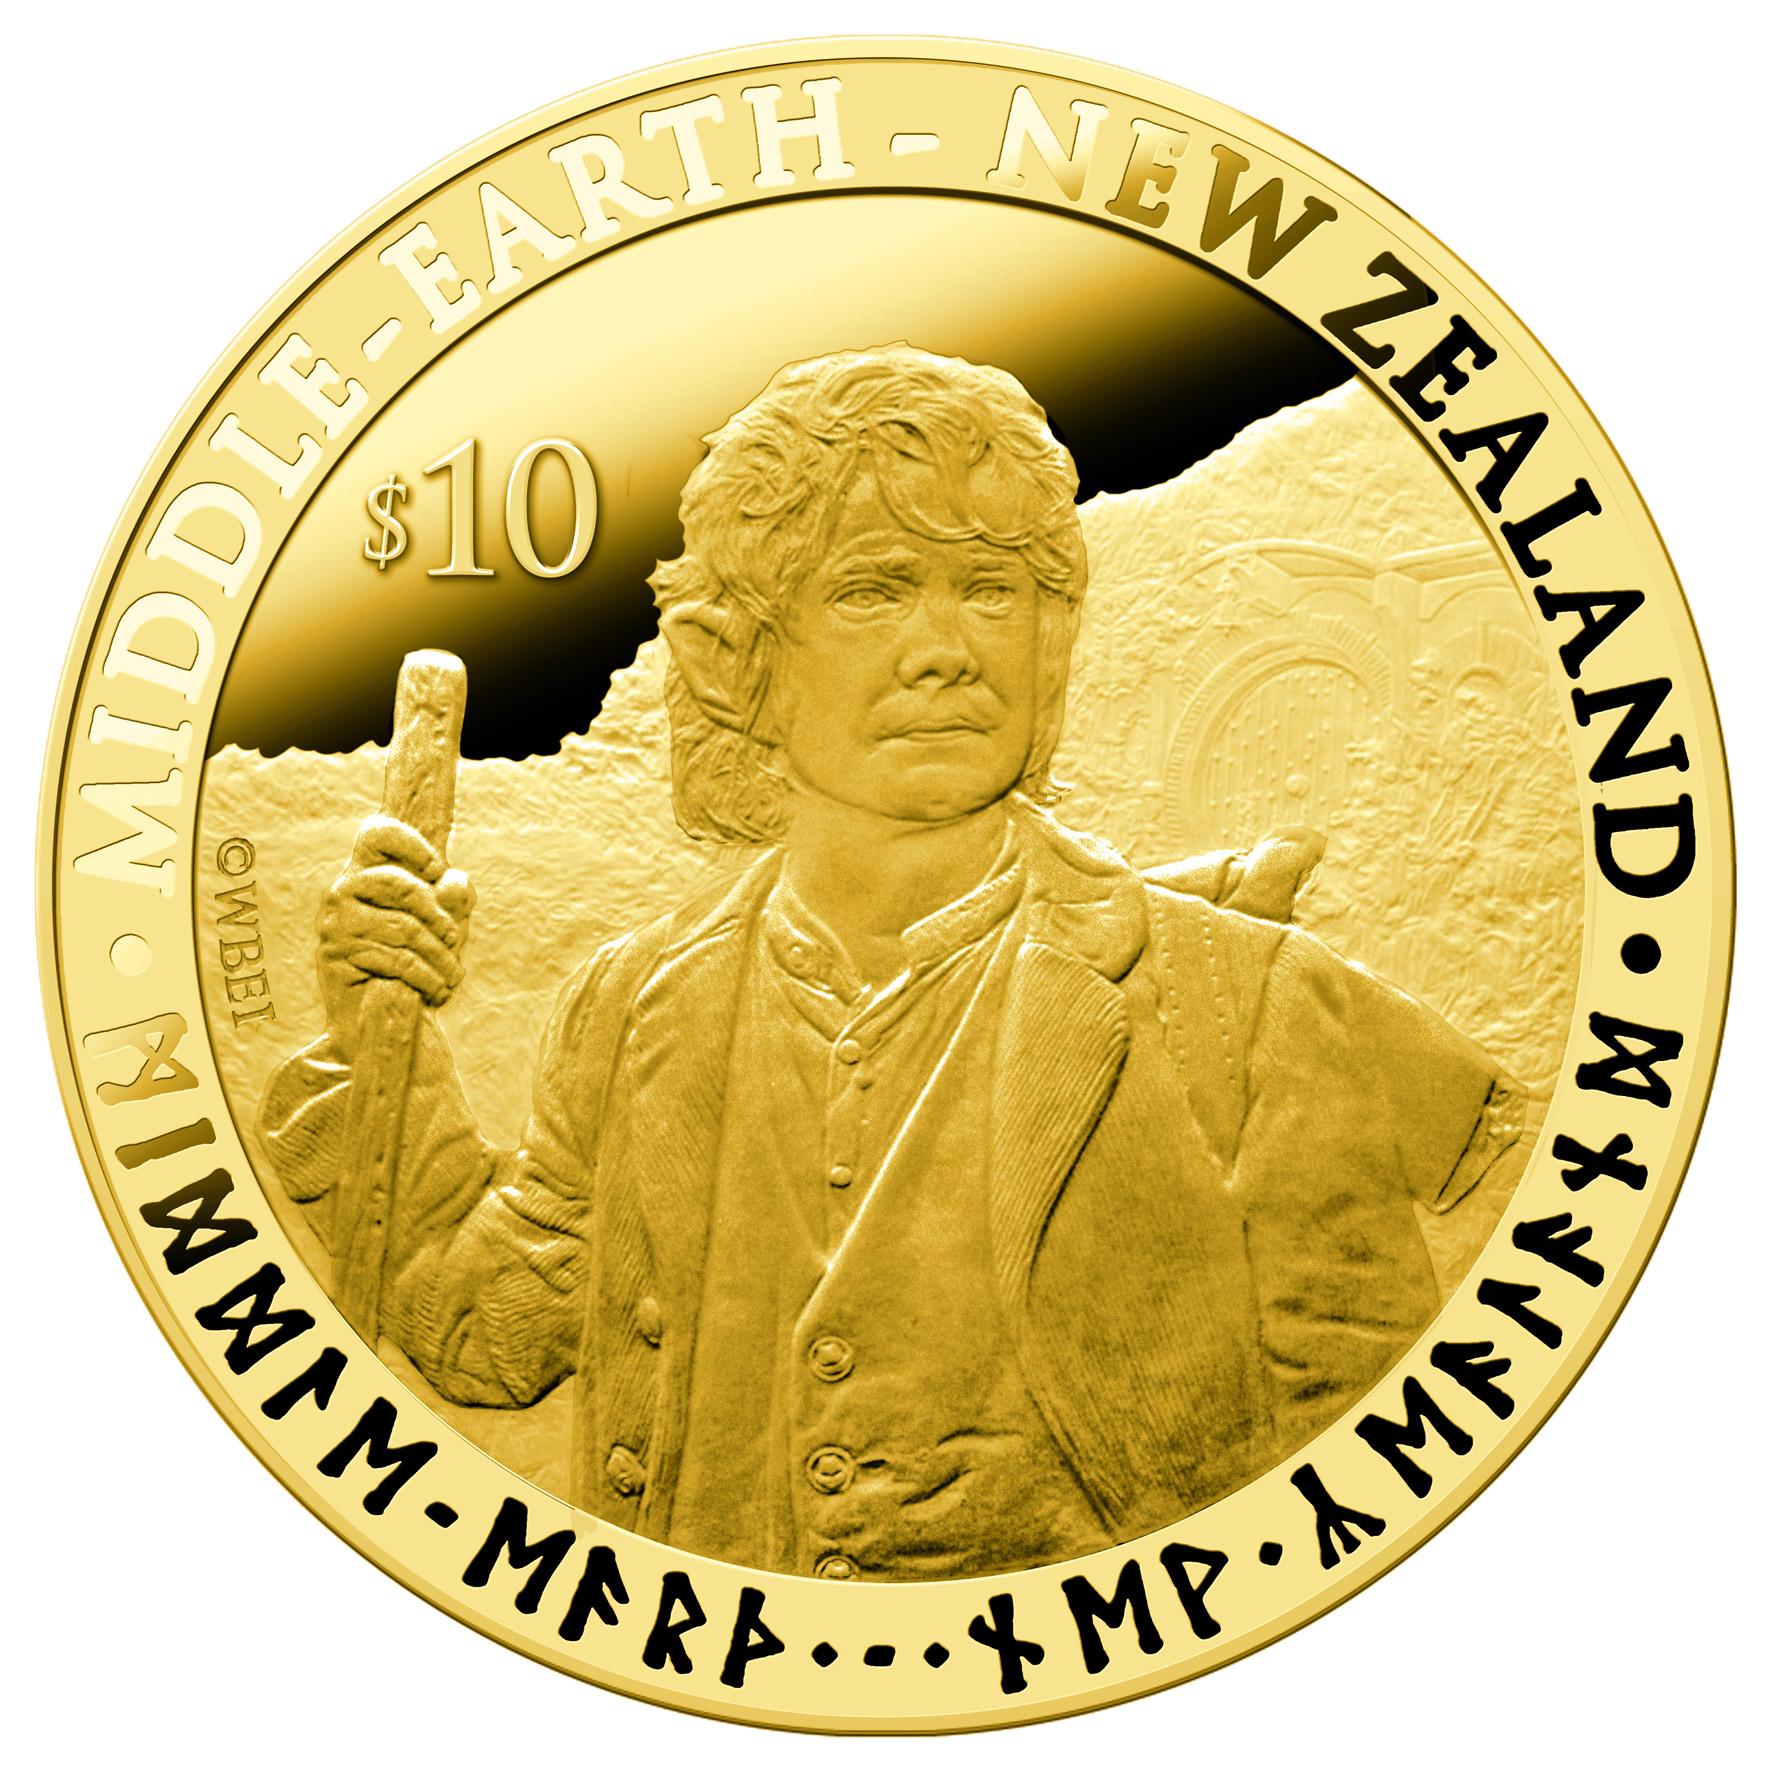 The Hobbit Coins of Sherlock's Freeman and Cumberbatch